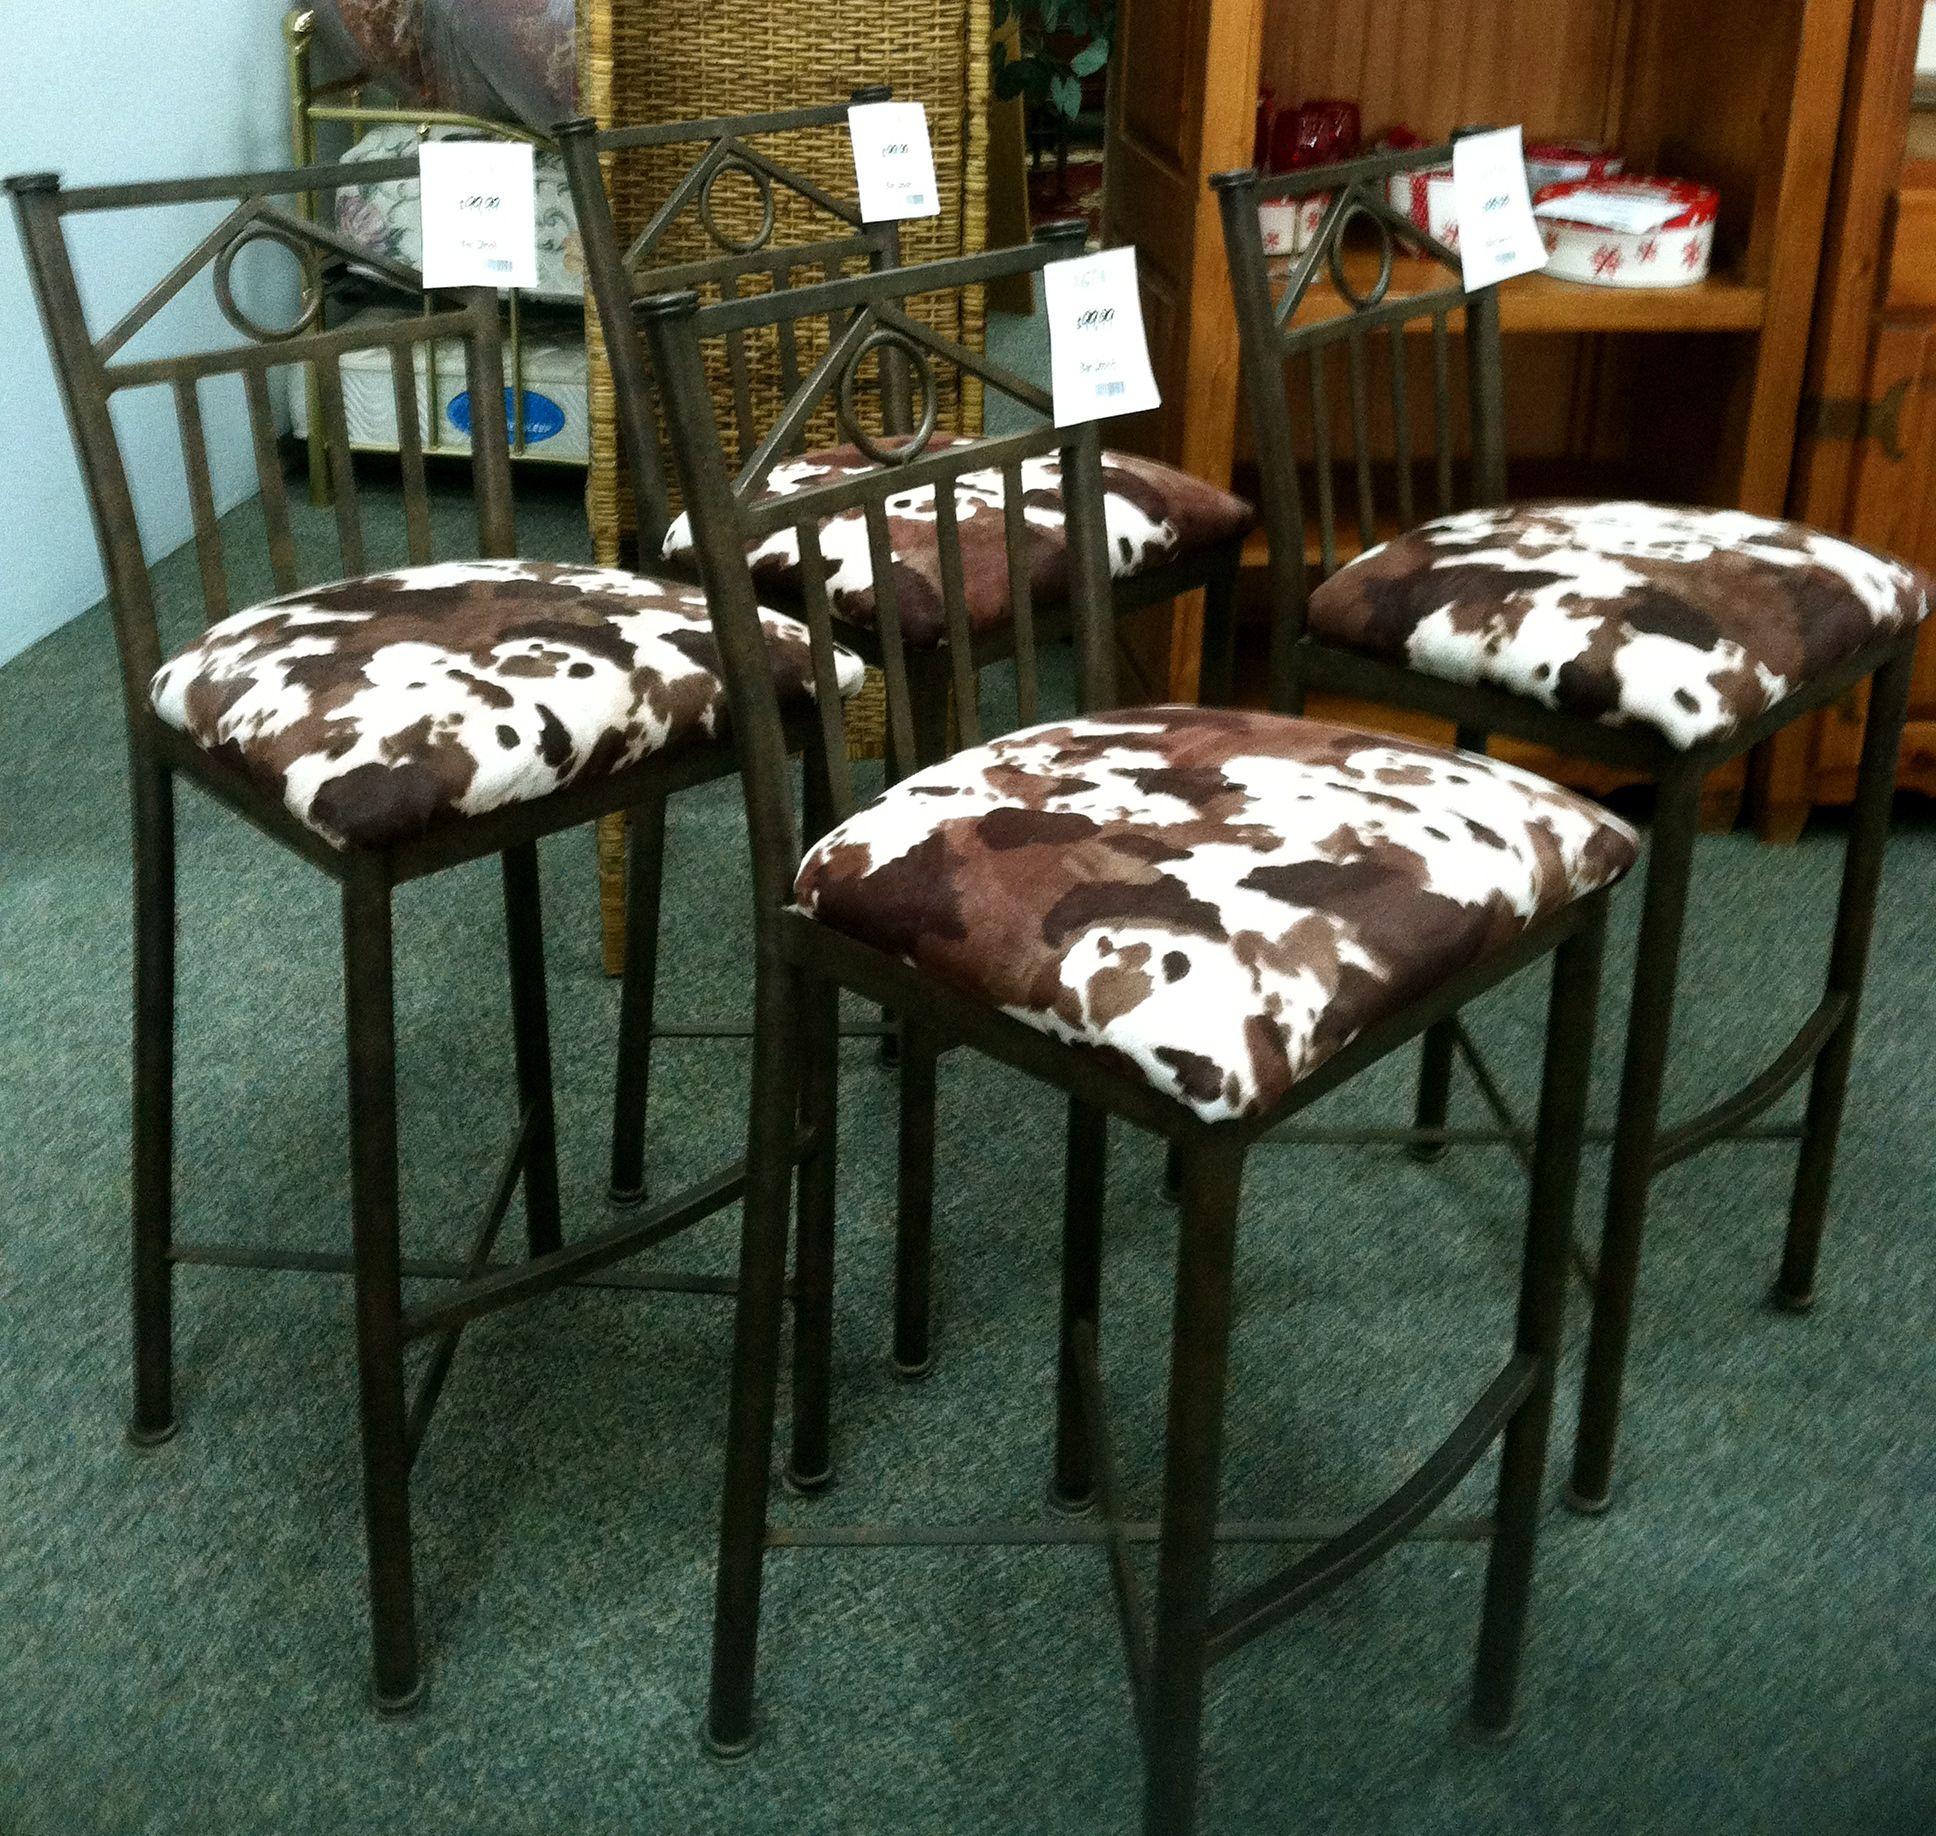 Terrific Cowhide Bar Stool We Have 4 Cowhide Barstools At Iconsign Inzonedesignstudio Interior Chair Design Inzonedesignstudiocom